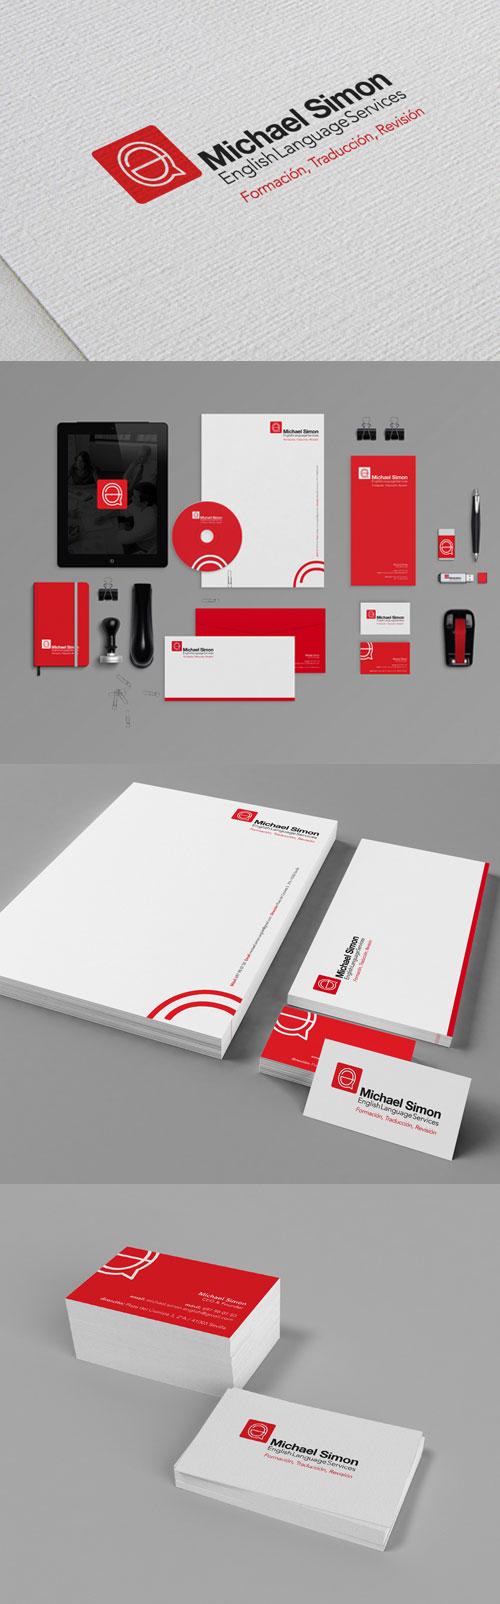 corporate_identity_design_5